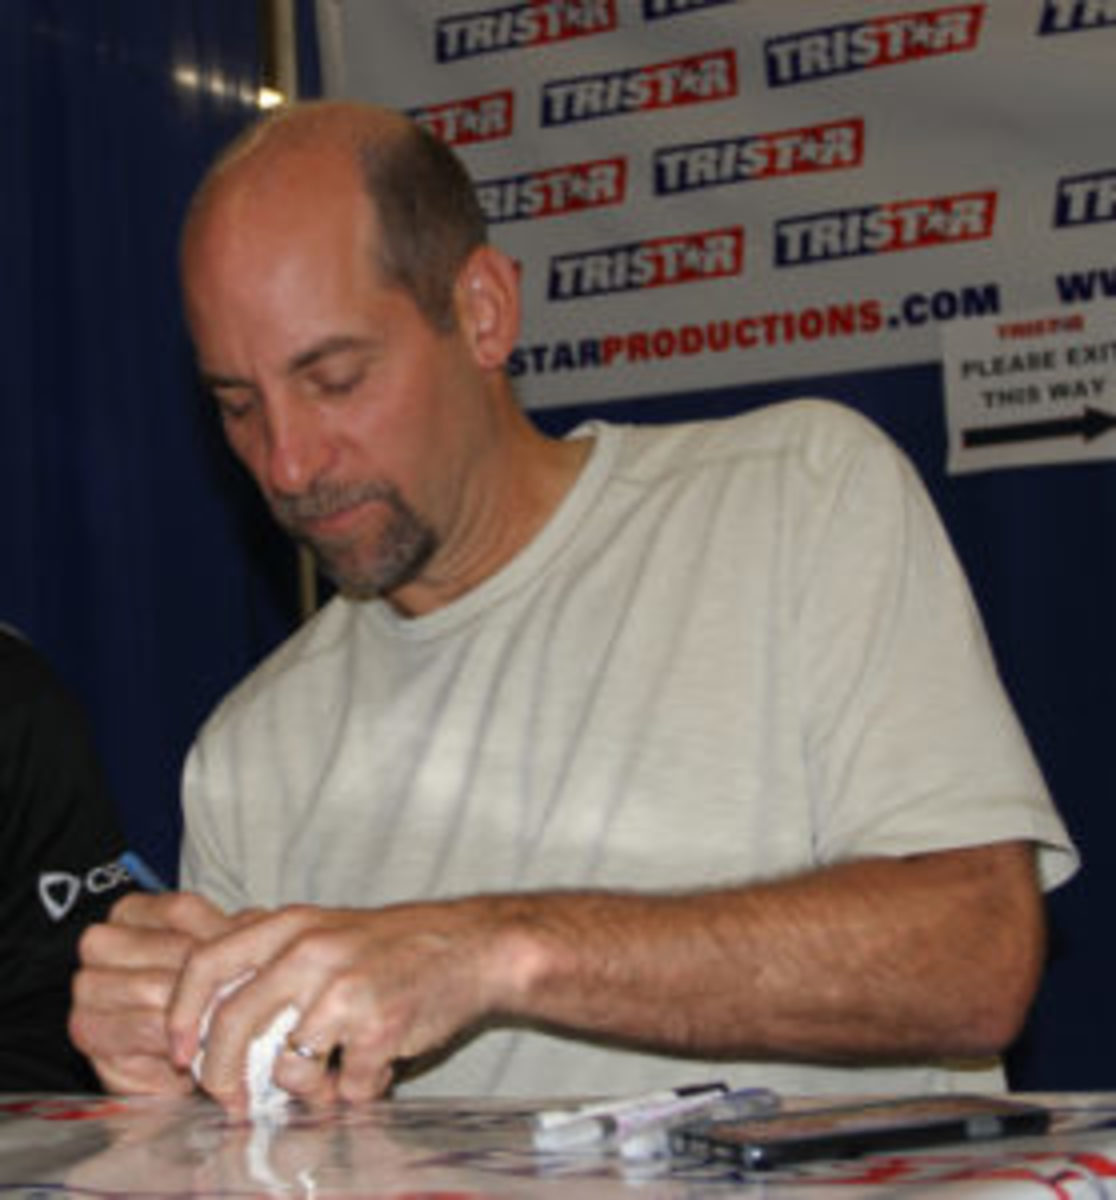 John Smoltz signs a baseball at a Tristar Productions show. (Ross Forman photo)